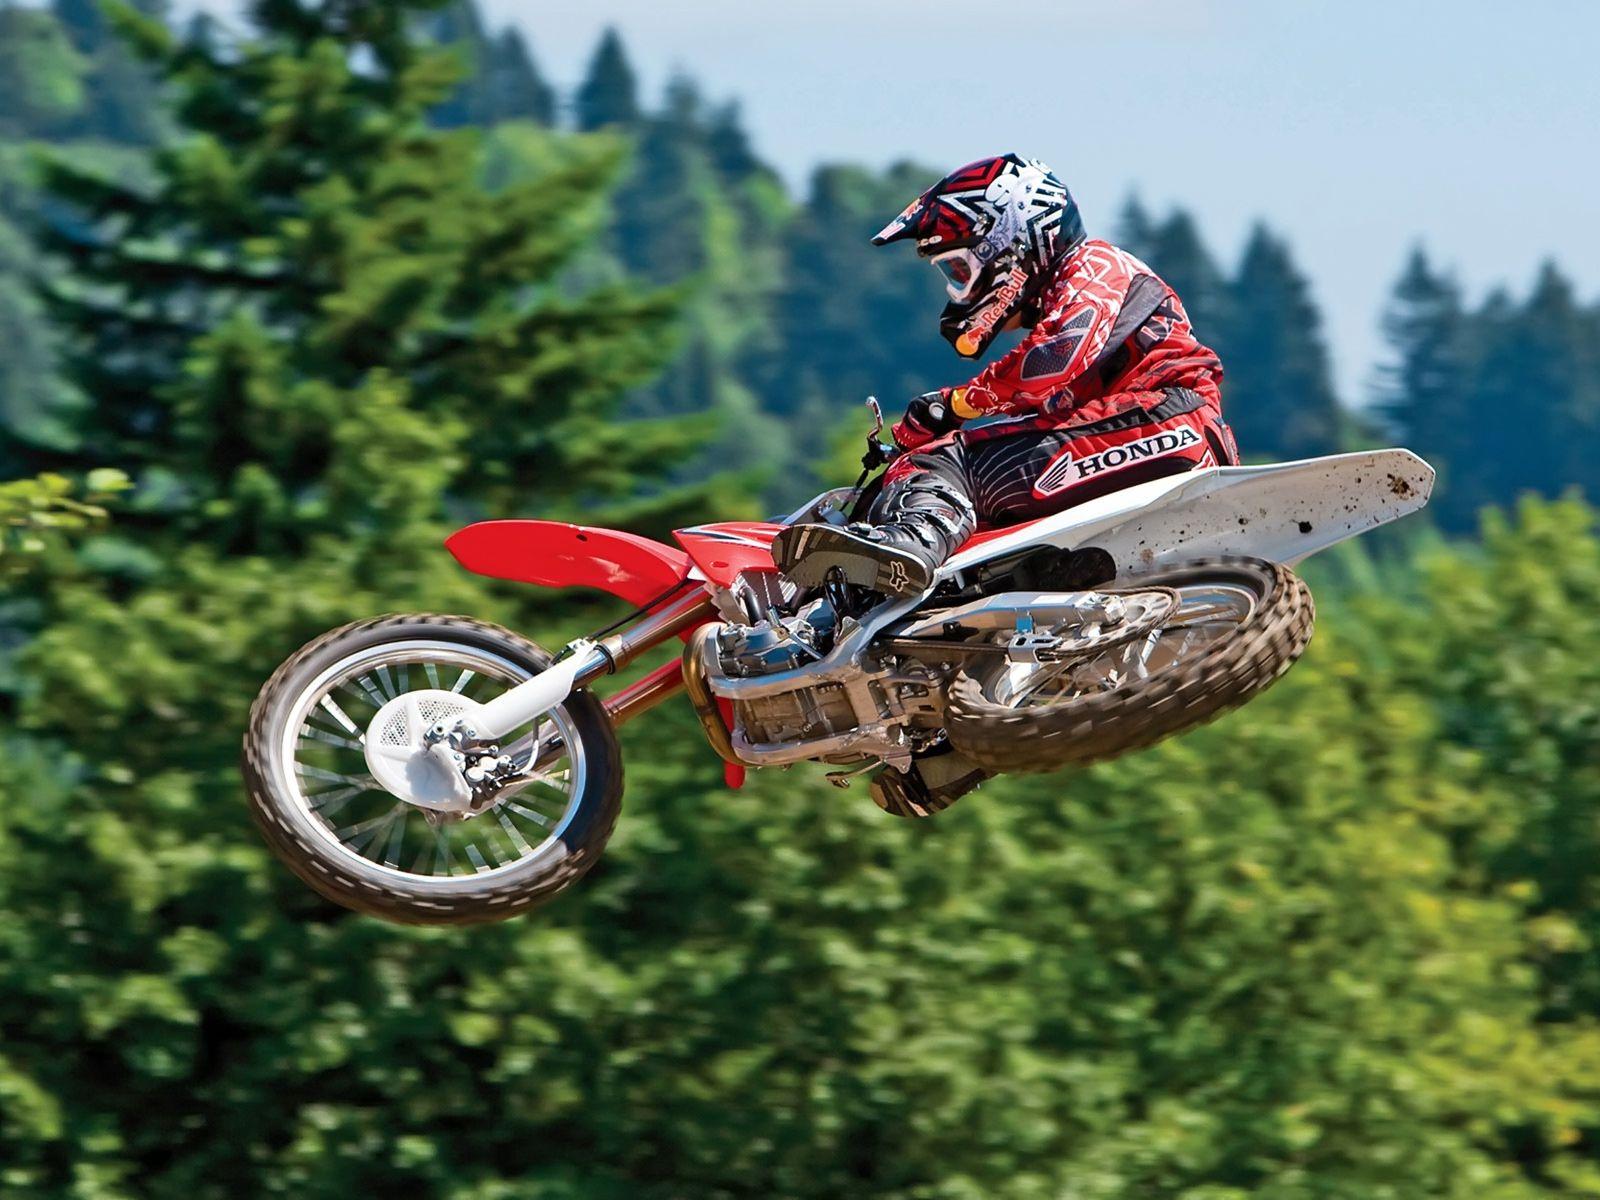 Motocross Jump Wall Motocross, Motocross action, Dirtbikes